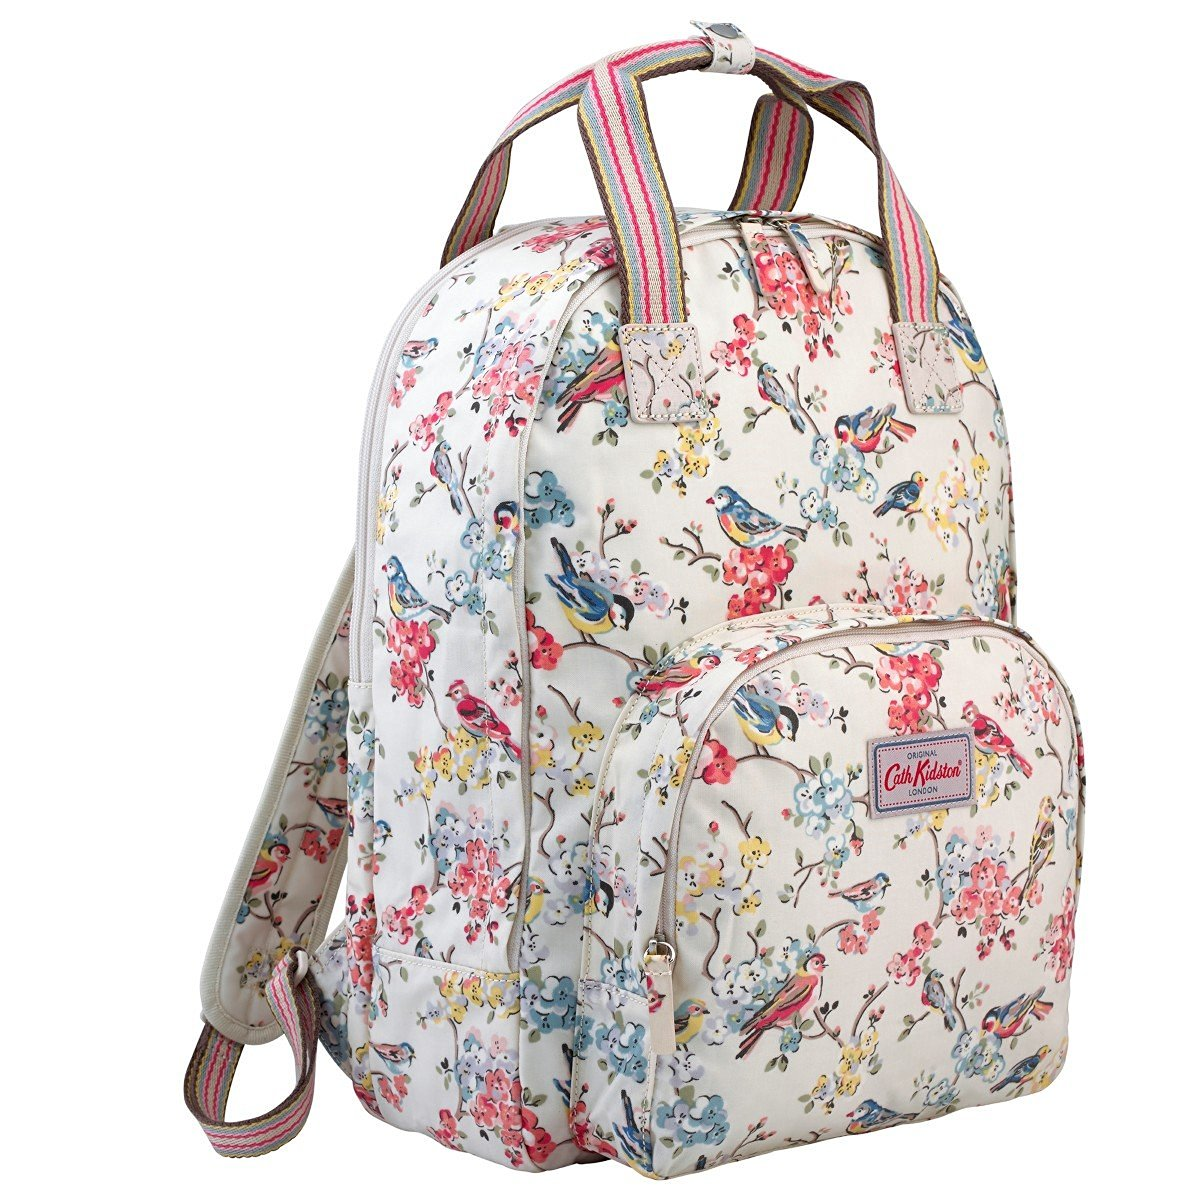 Cath Kidston Matt Oilcloth Multi Pocket Backpack Rucksack London Streets Colour Ivory